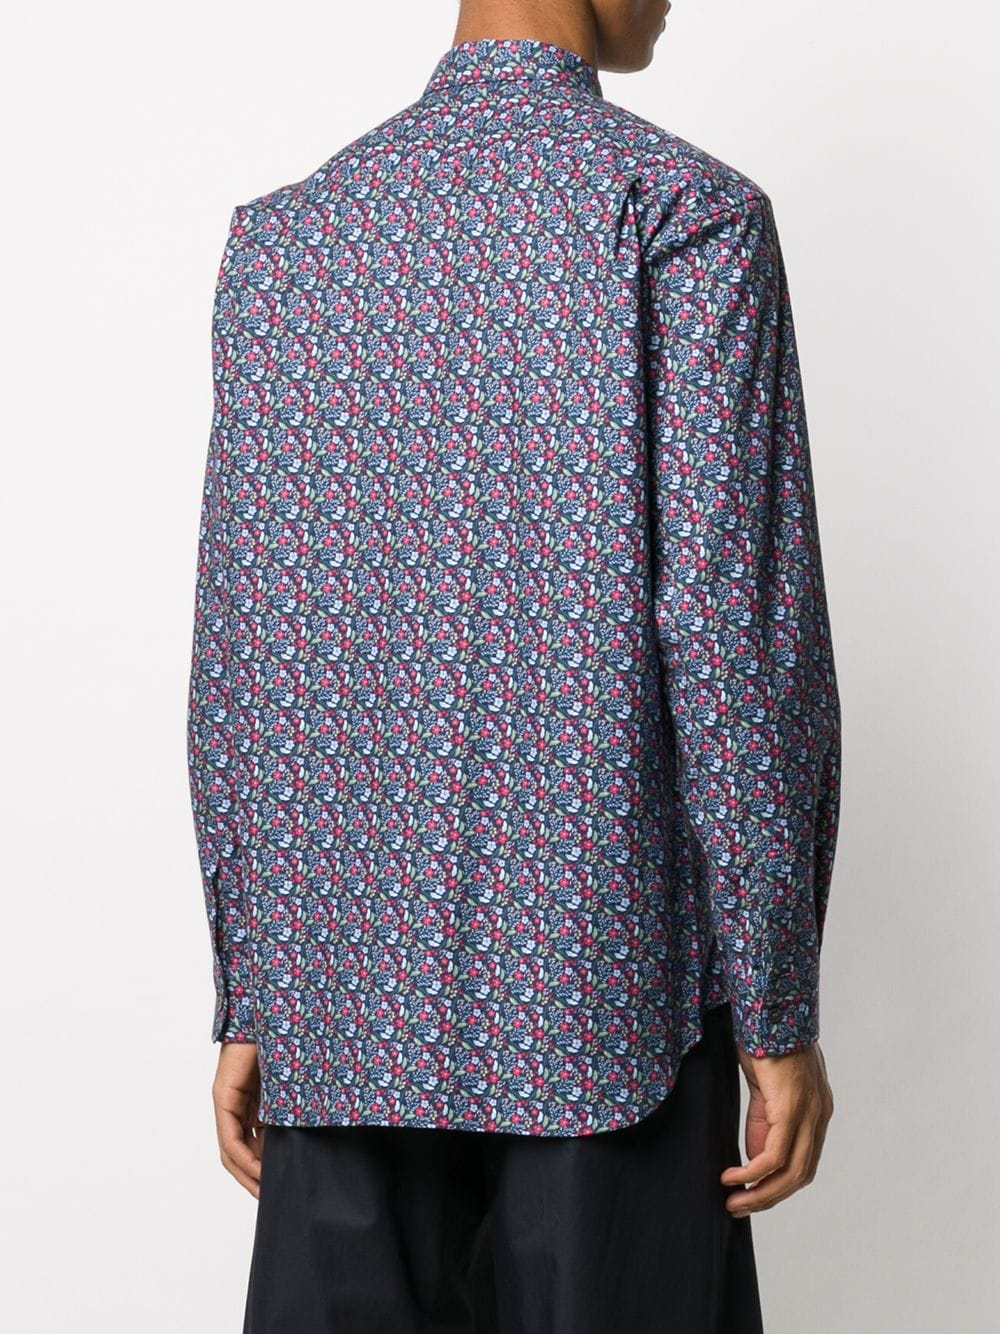 Picture of Comme Shirt | Floral-Print Cotton Shirt